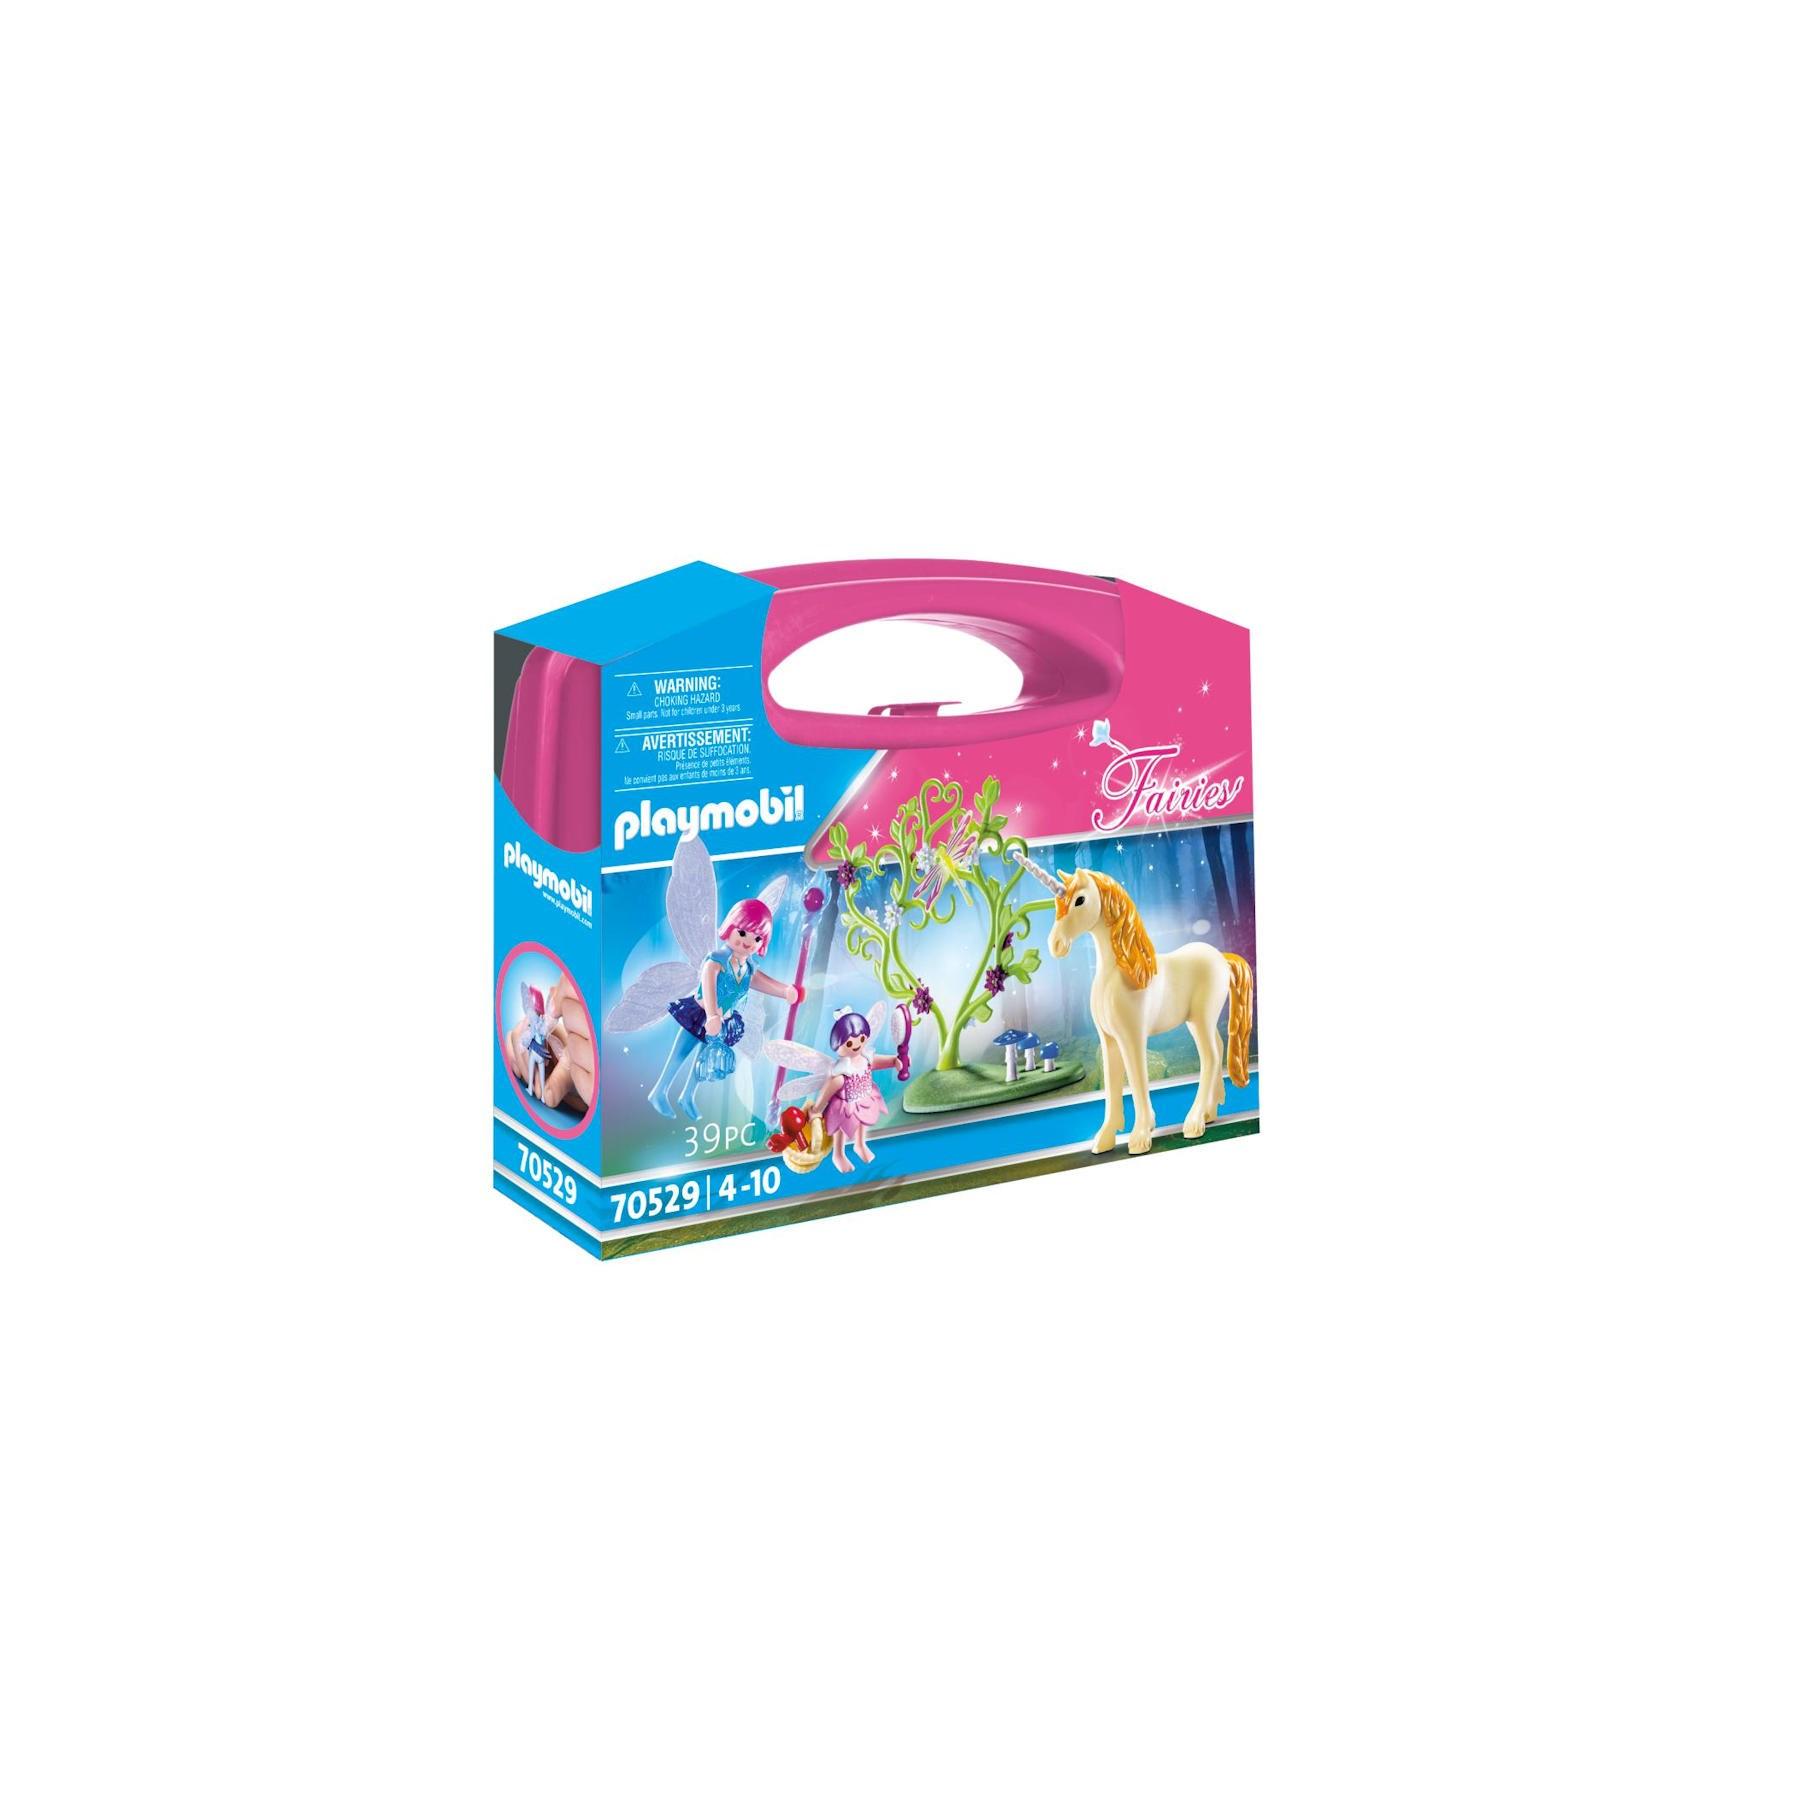 playmobil fairy unicorn carry case 70529